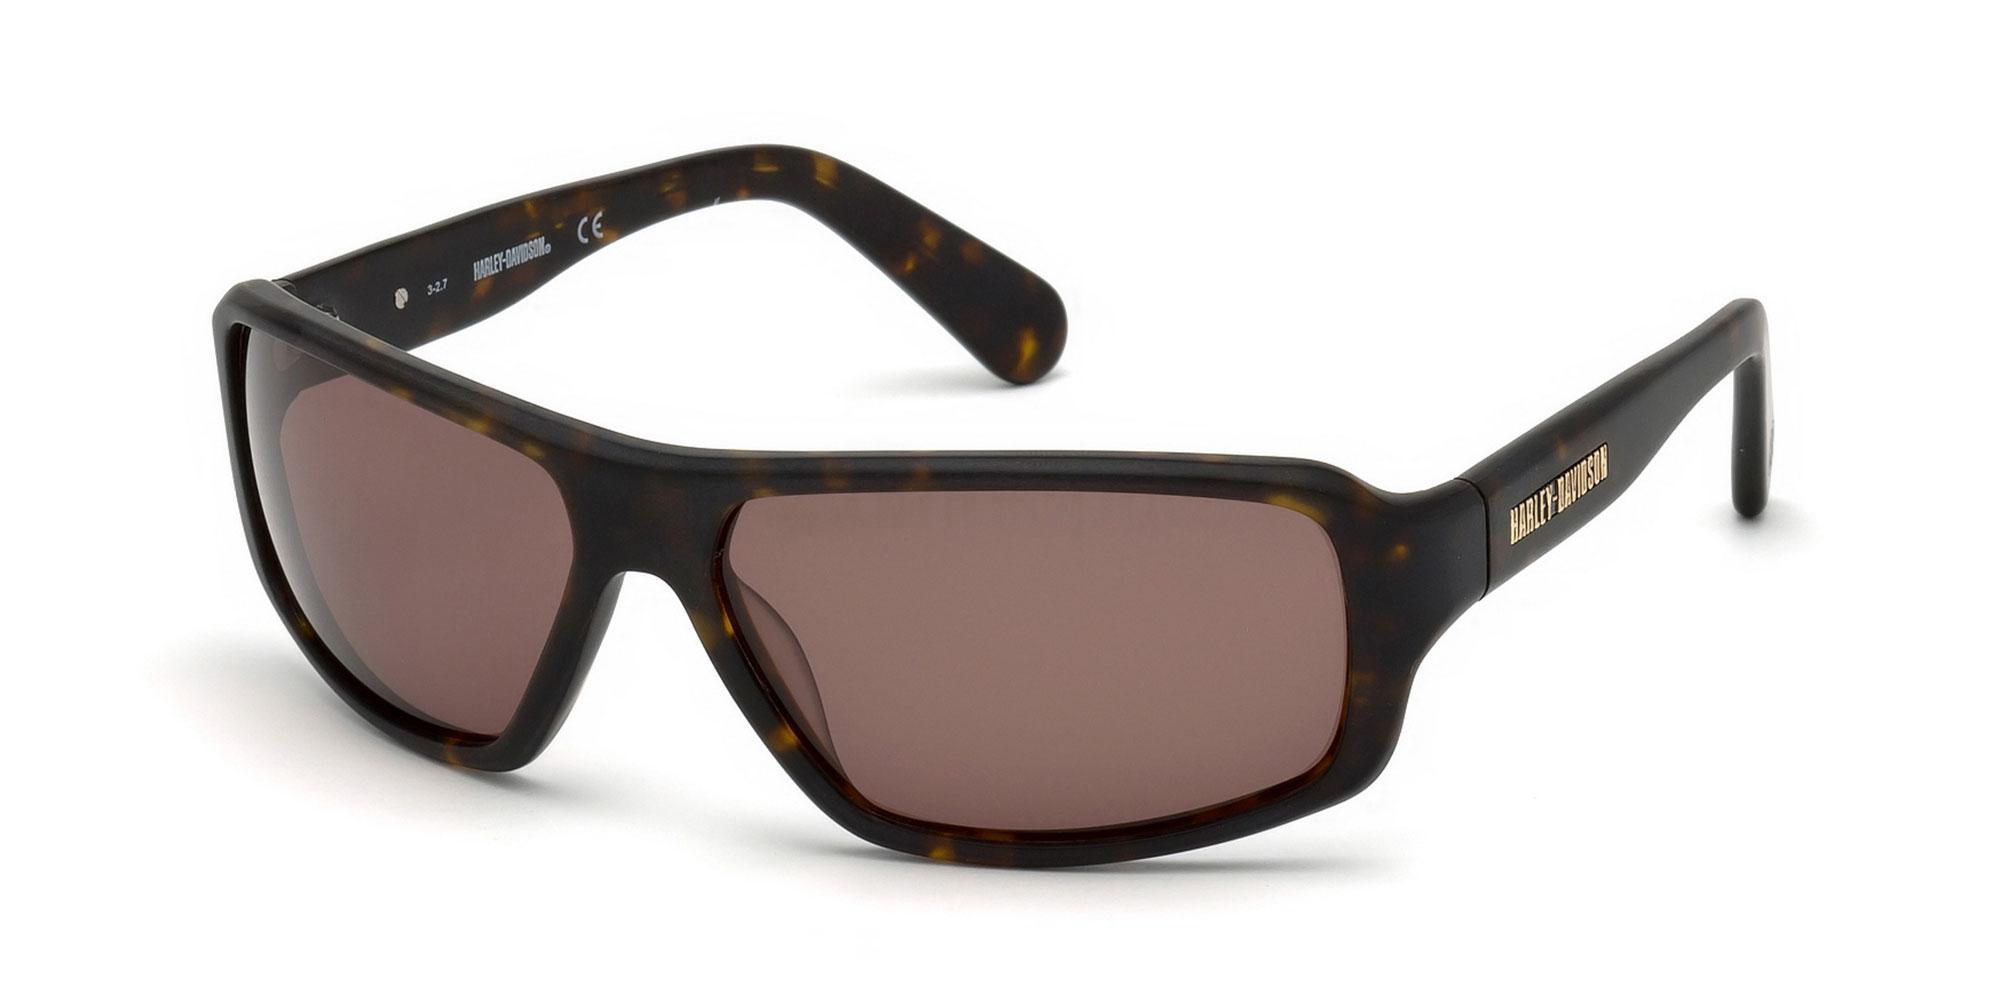 52E HD0921X Sunglasses, Harley Davidson